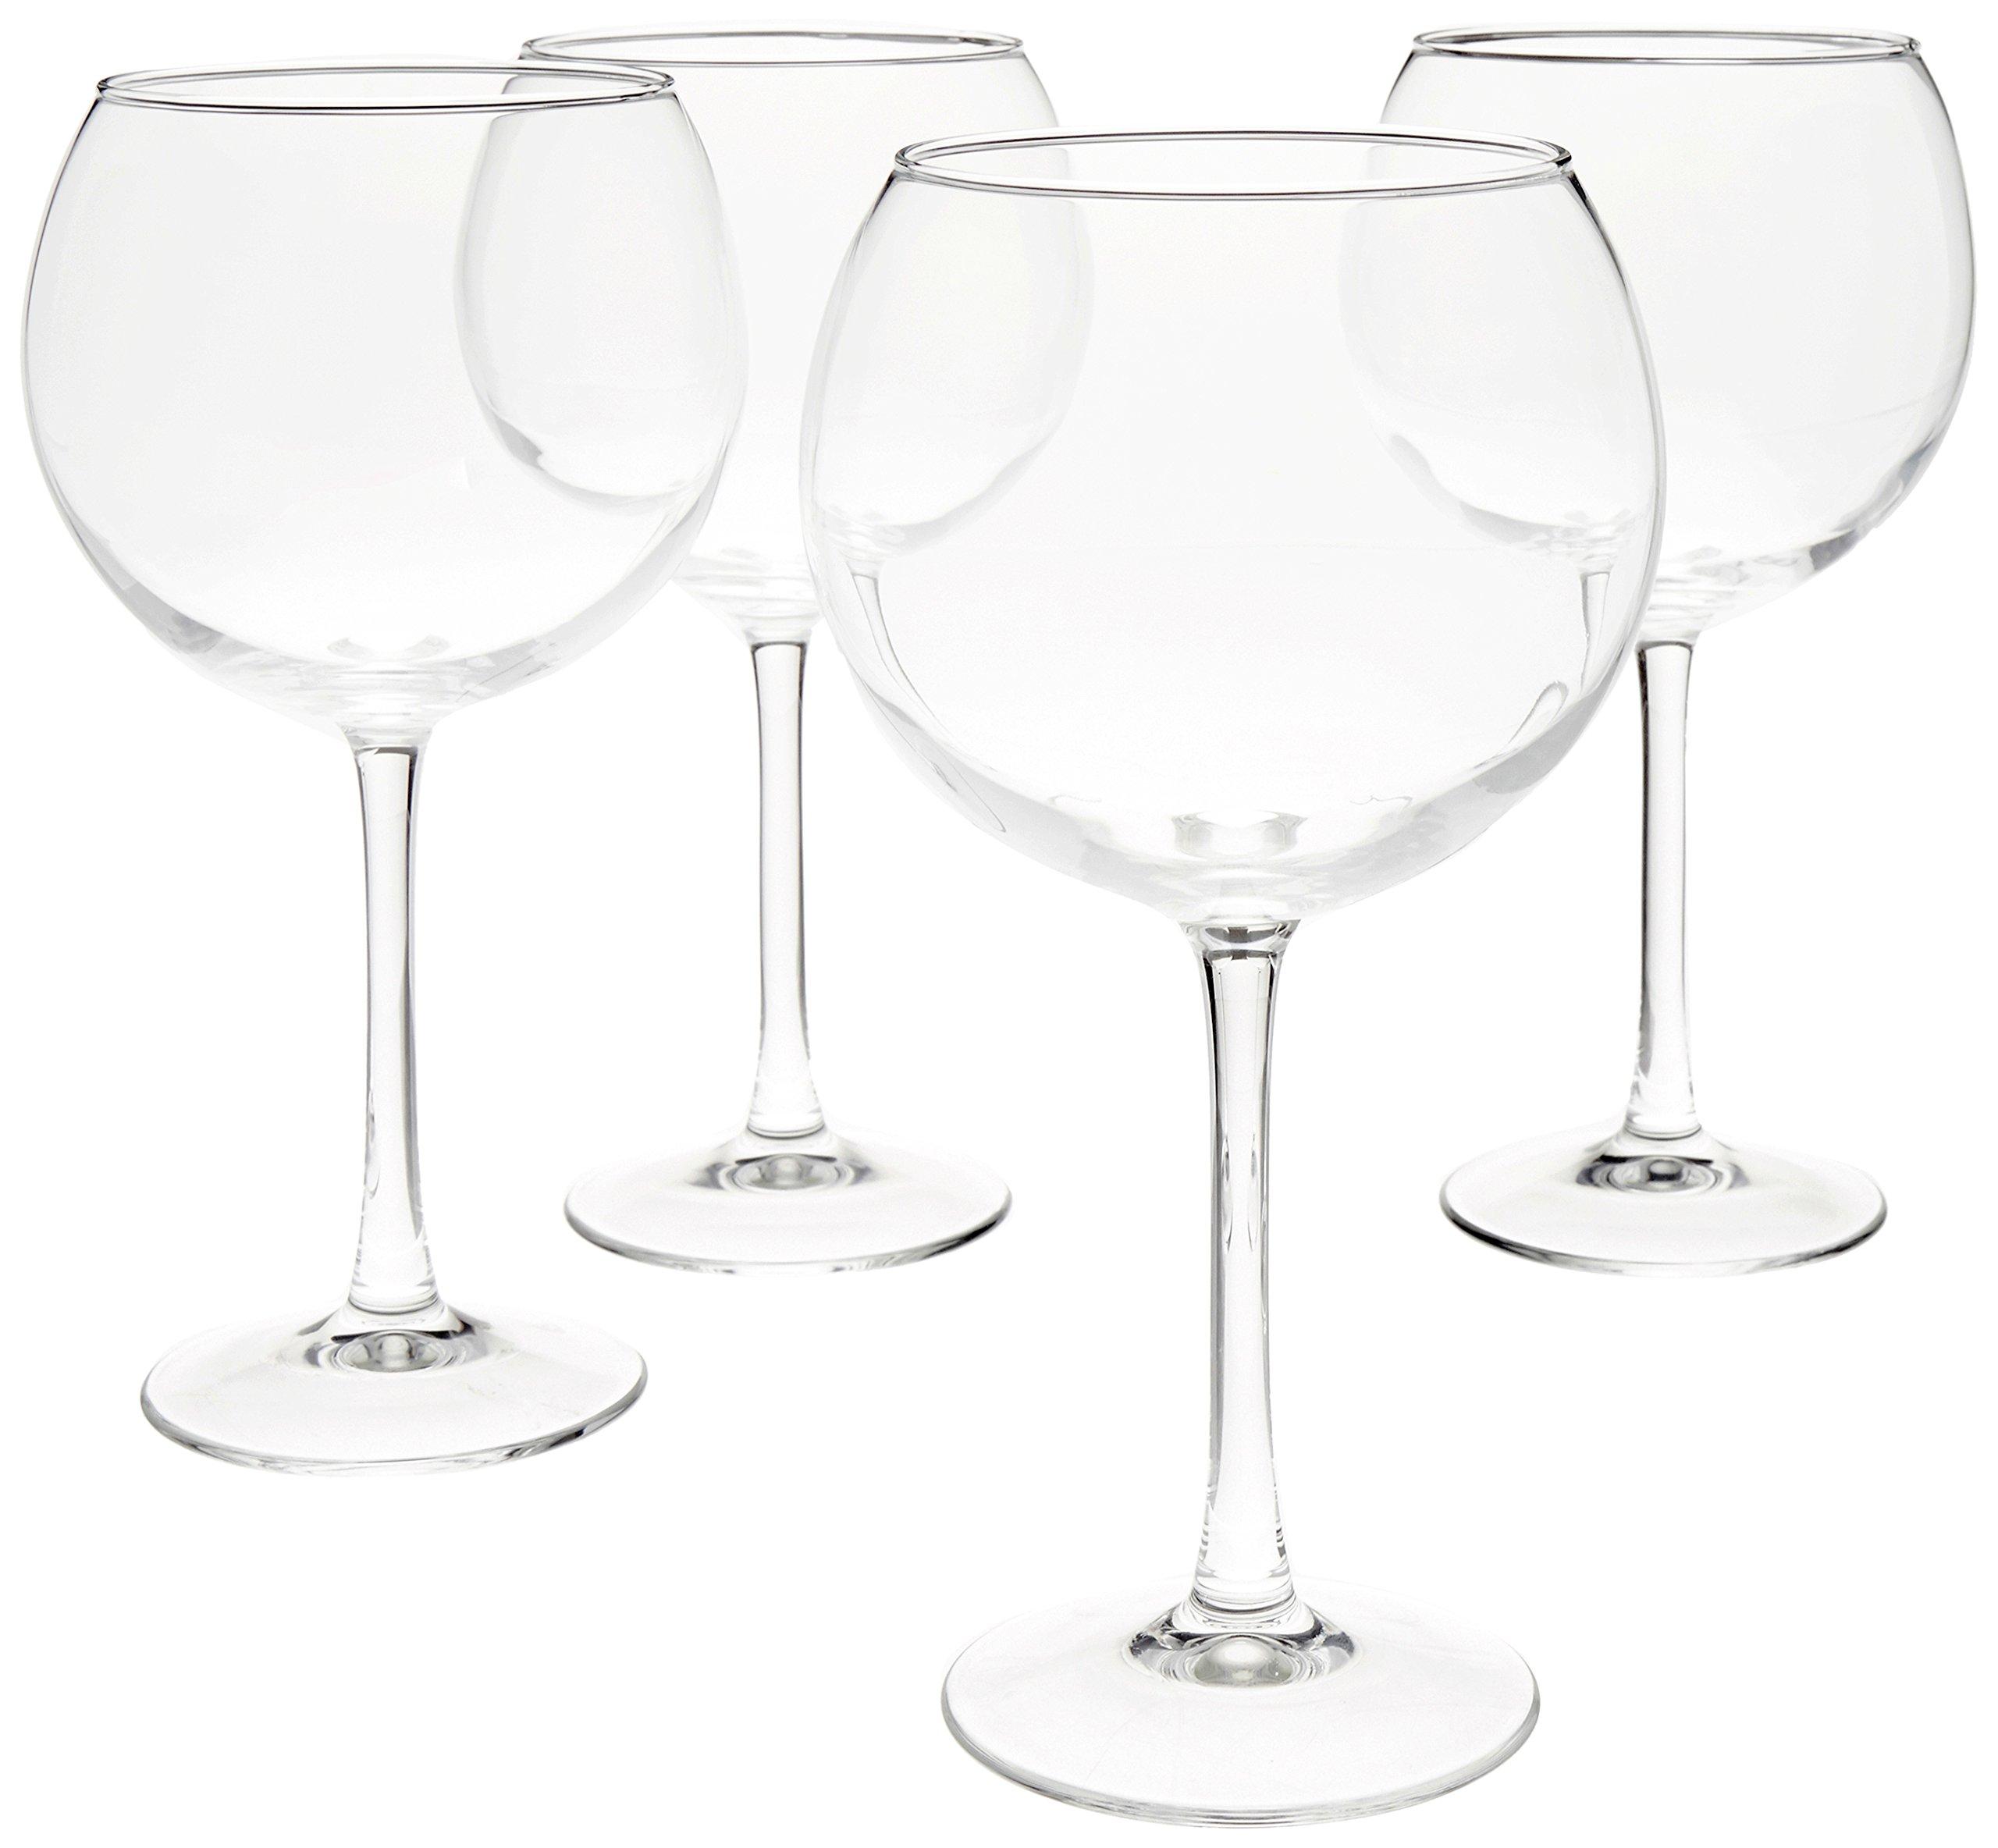 AmazonBasics Red Wine Balloon Wine Glasses, 20-Ounce, Set of 4 by AmazonBasics